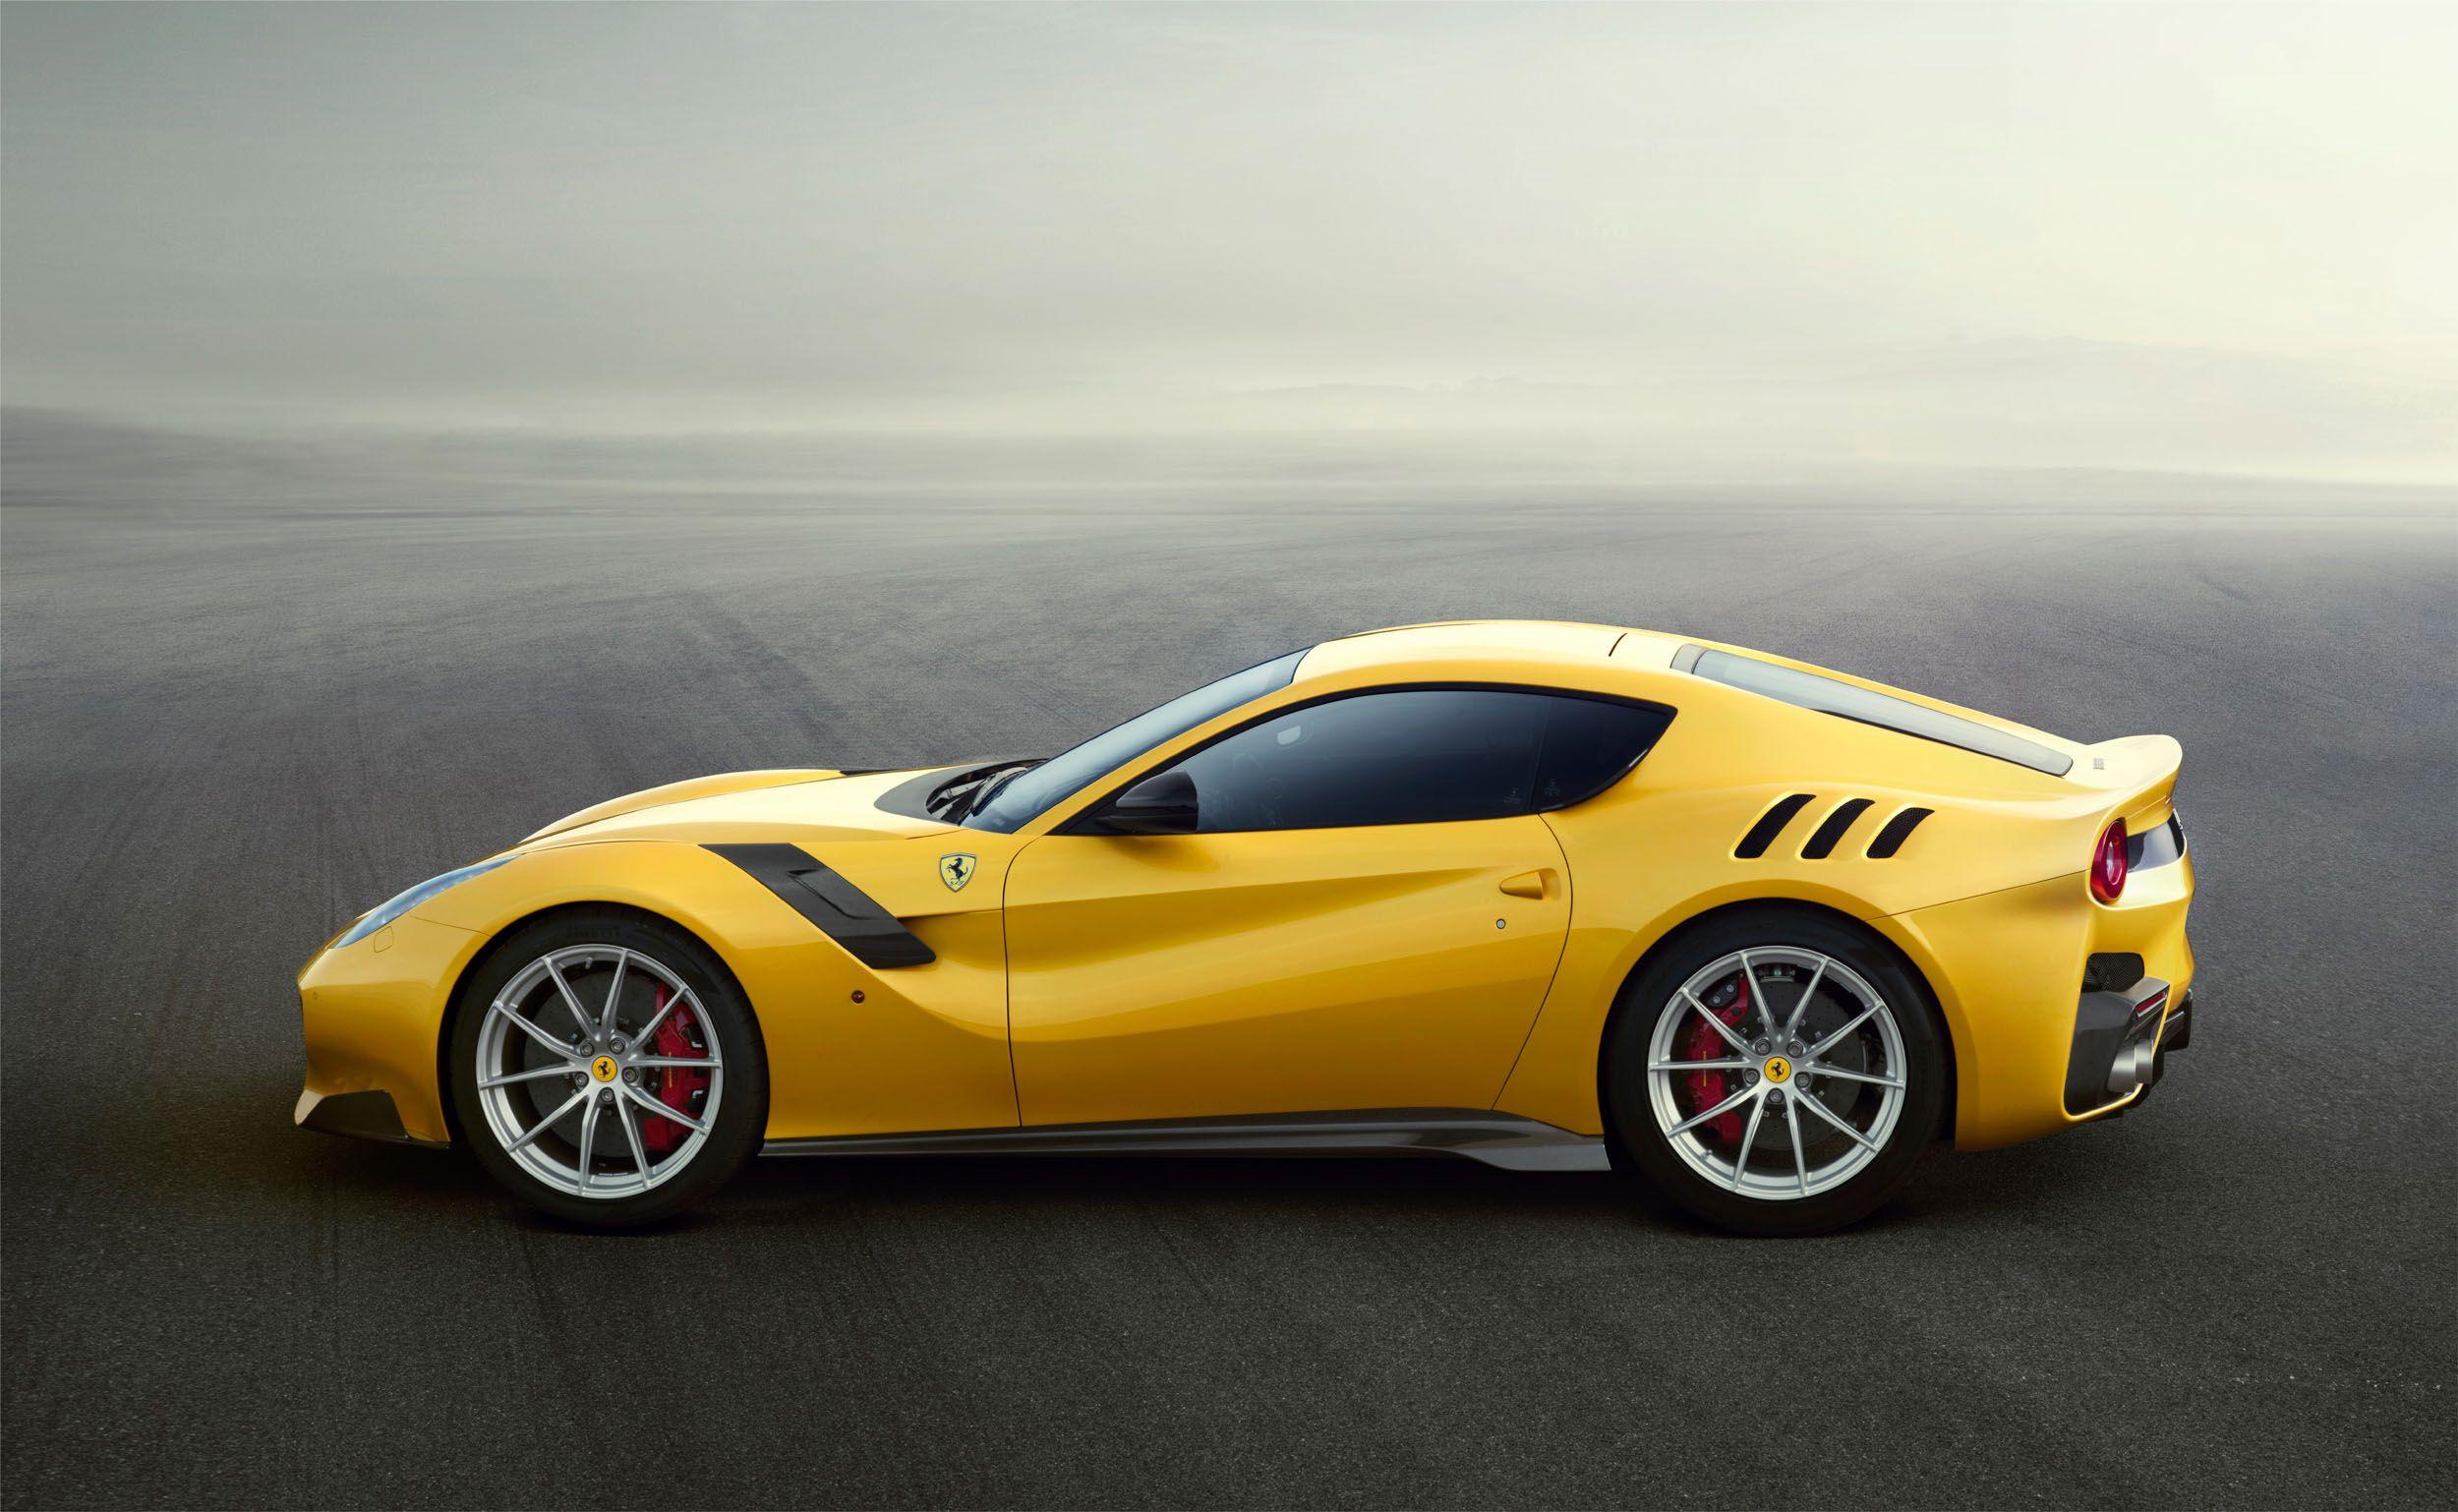 F12berlinetta Pales In Comparison To Ferrari S Newest 770 Hp F12tdf Supercar Cf Blog Ferrari F12 Tdf Ferrari F12 Ferrari F12berlinetta